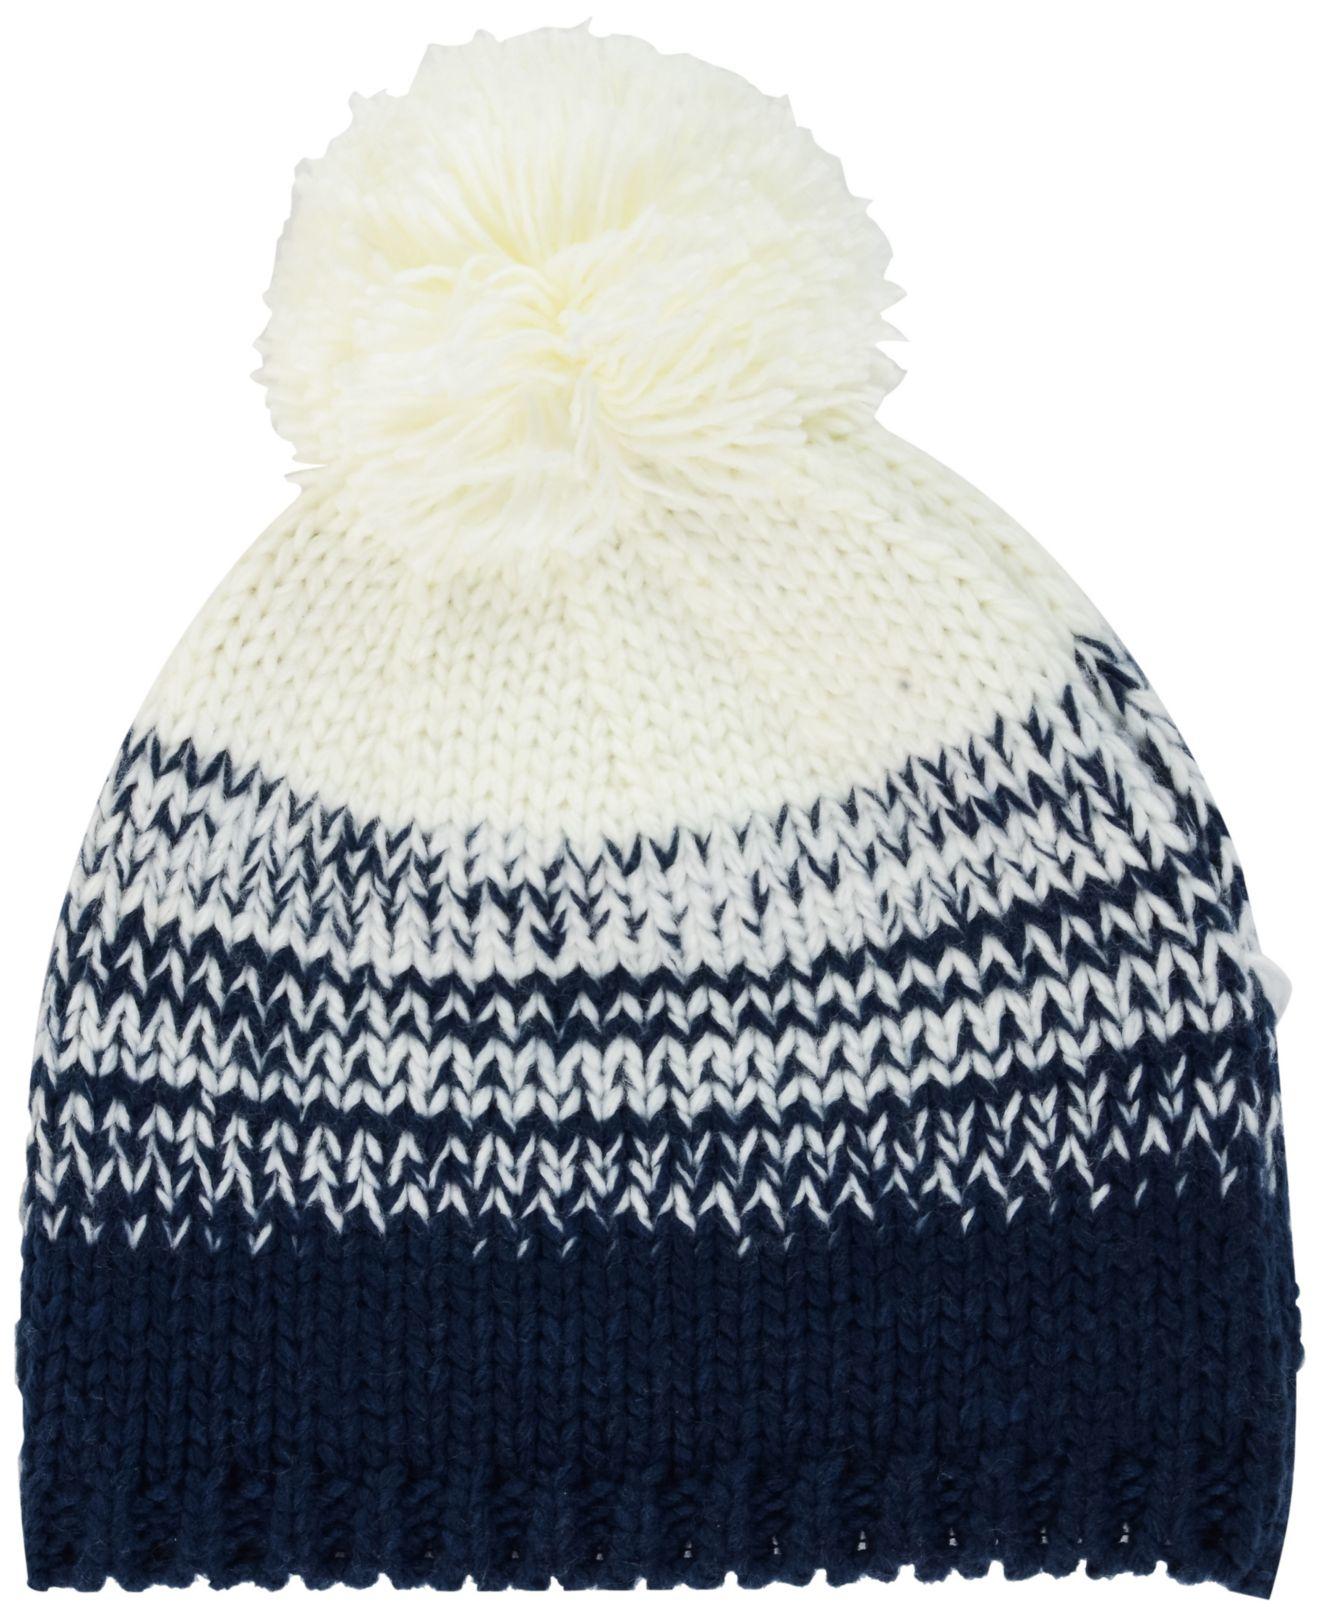 ... lyst ktz womens new england patriots polar dust knit hat in white fdeda  85525 uk womens new england patriots new era red 2018 nfl sideline cold  weather ... 971fab8ec73d